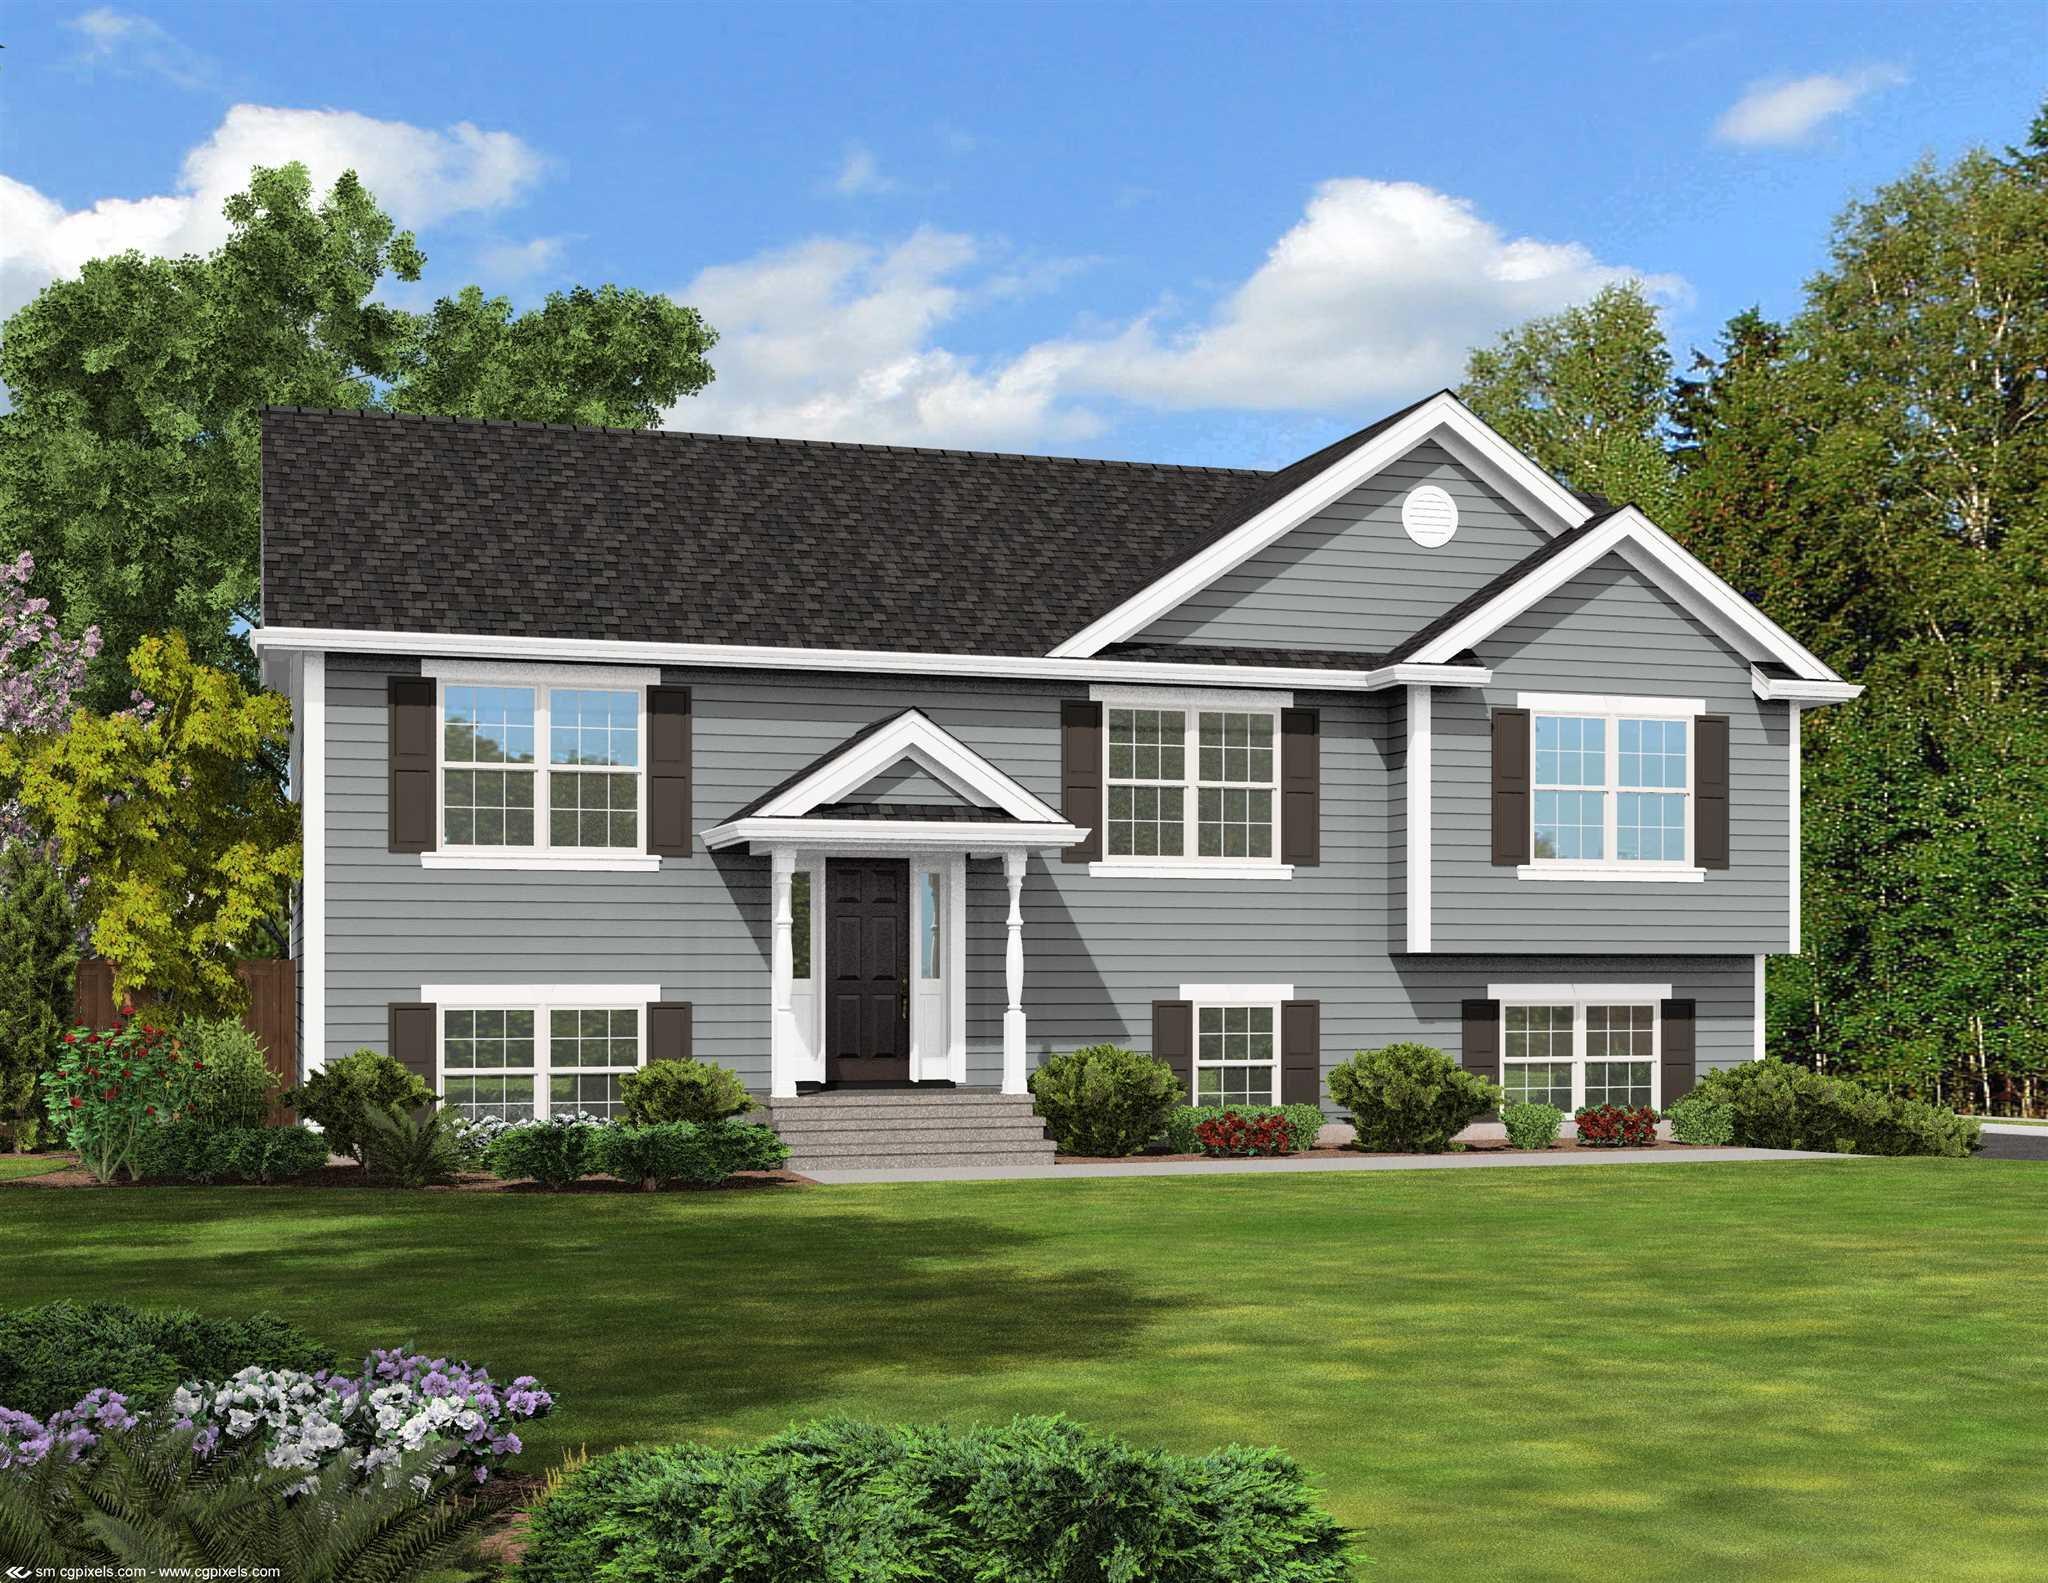 Single Family Home for Sale at 443 MILTON TURNPIKE 443 MILTON TURNPIKE Marlboro, New York 12547 United States